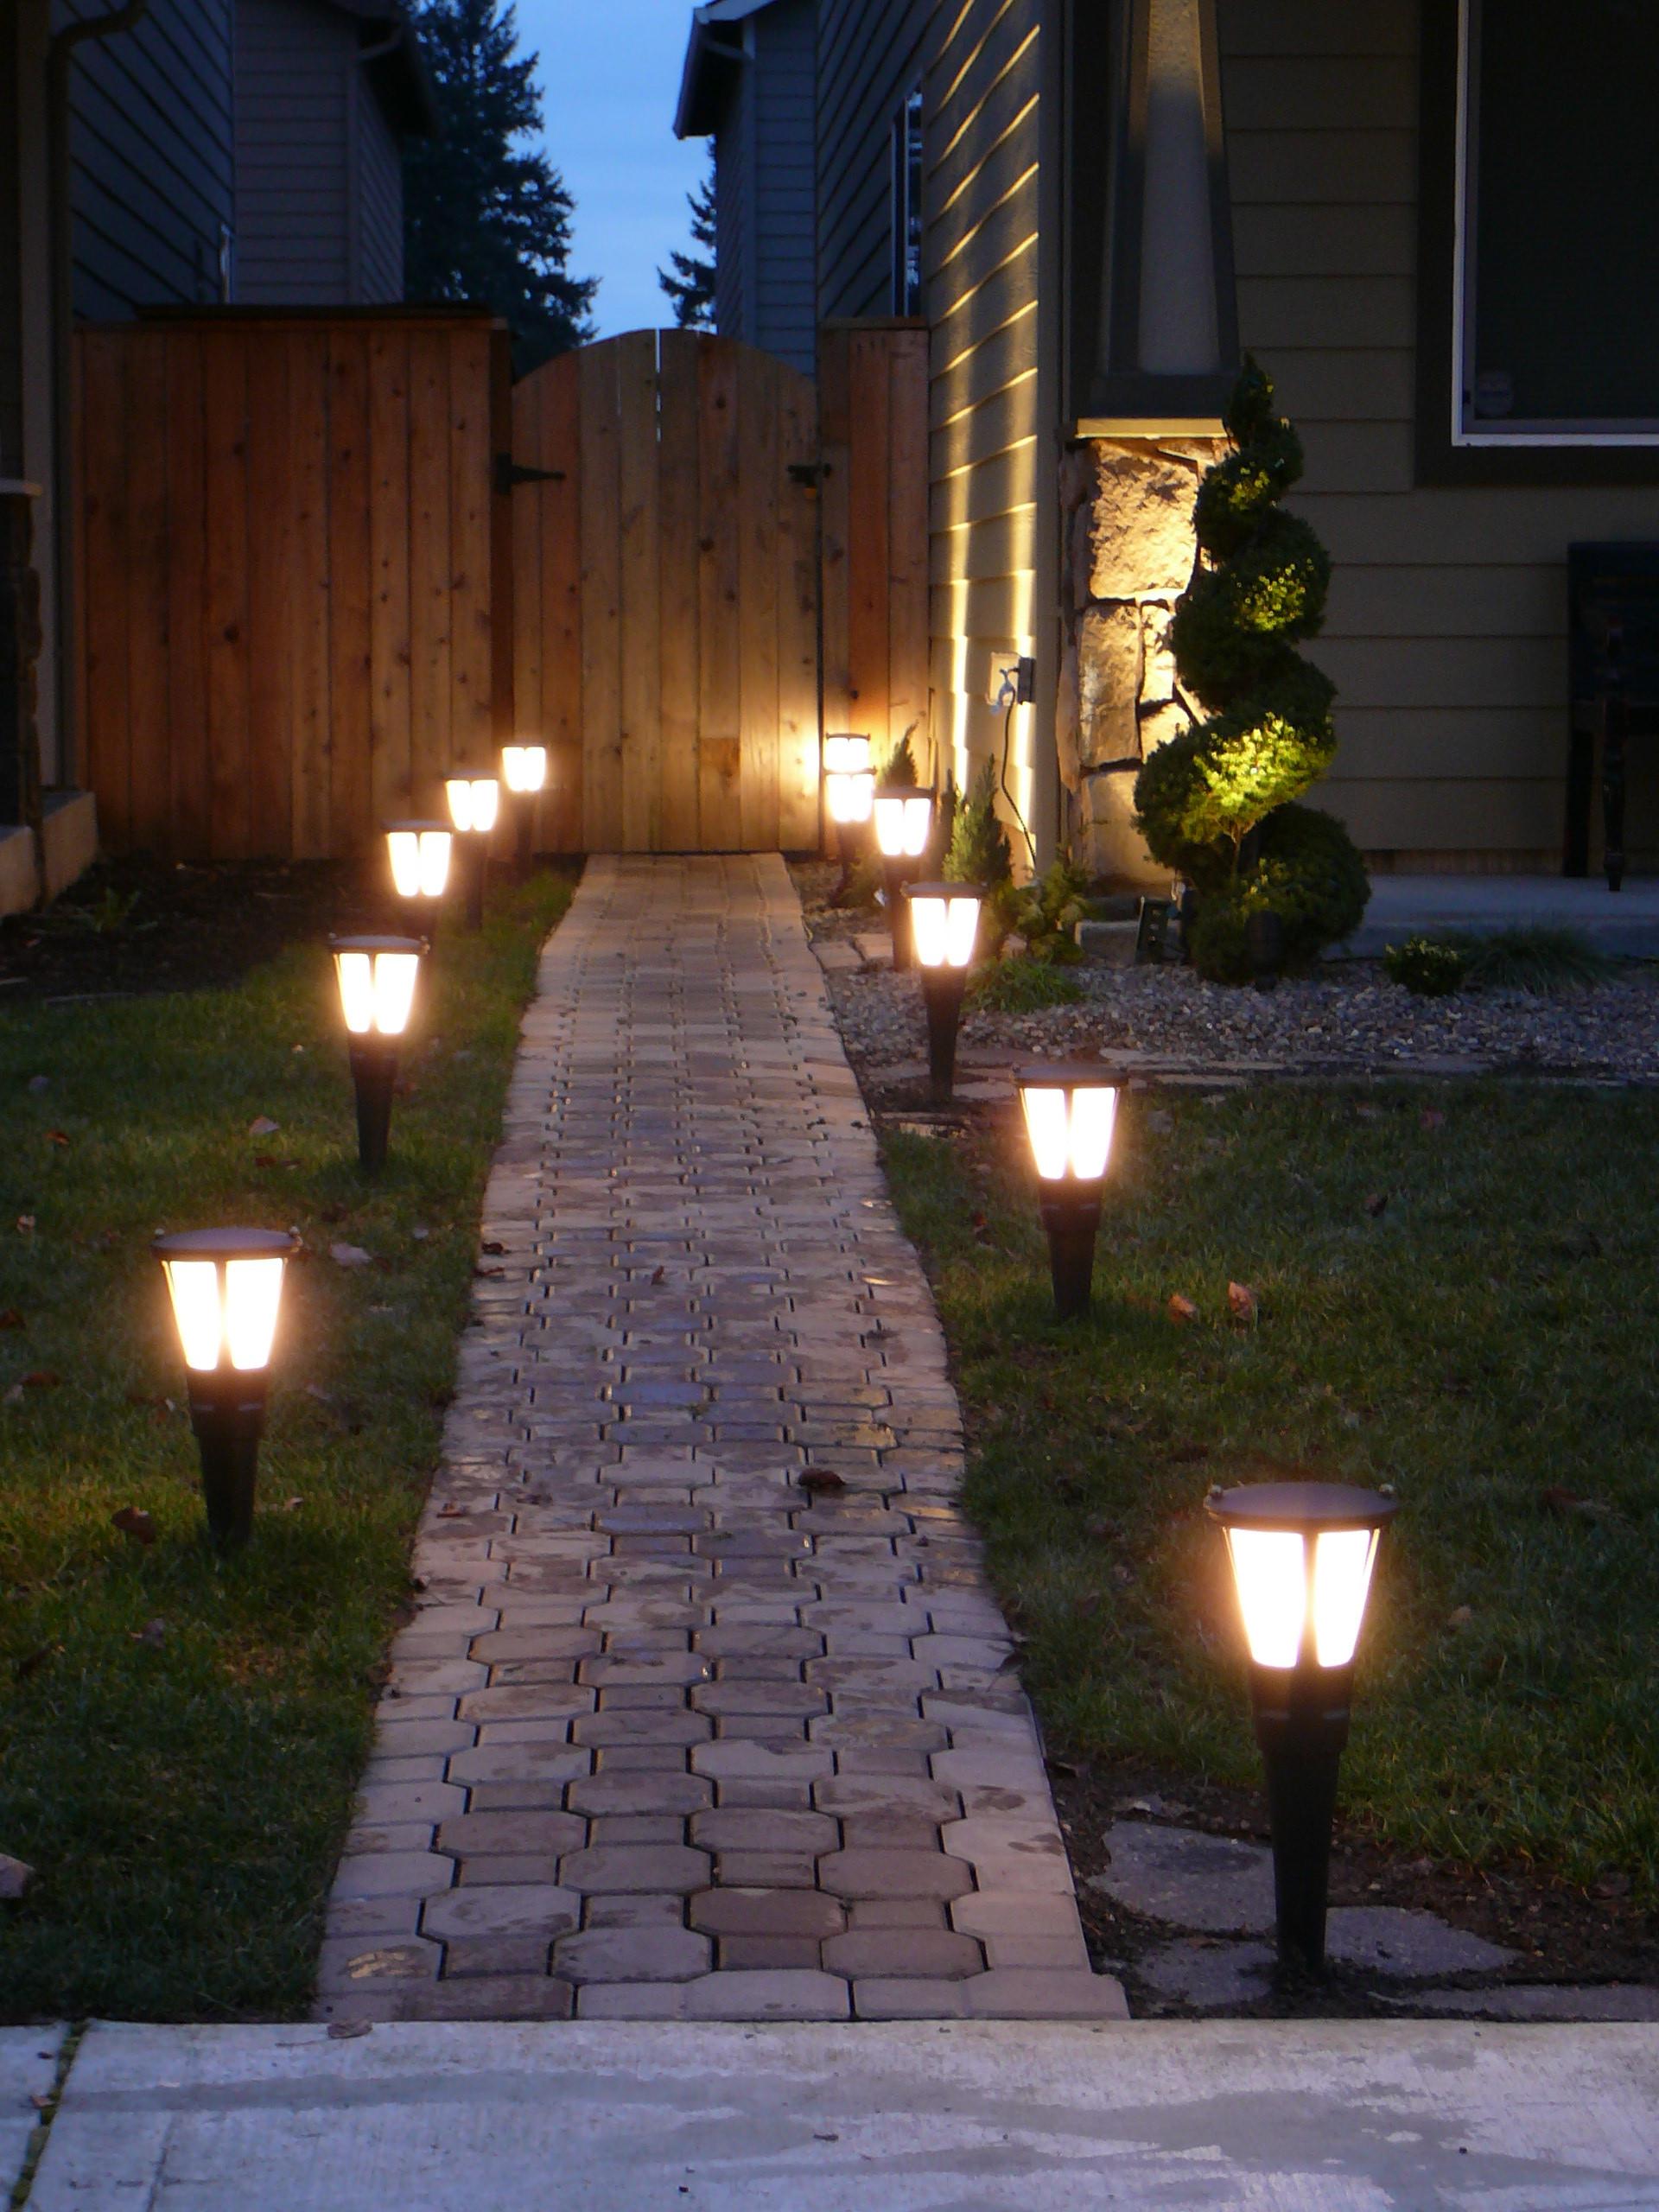 Landscape Path Lighting Elegant 5 Ways to Add Curb Appeal